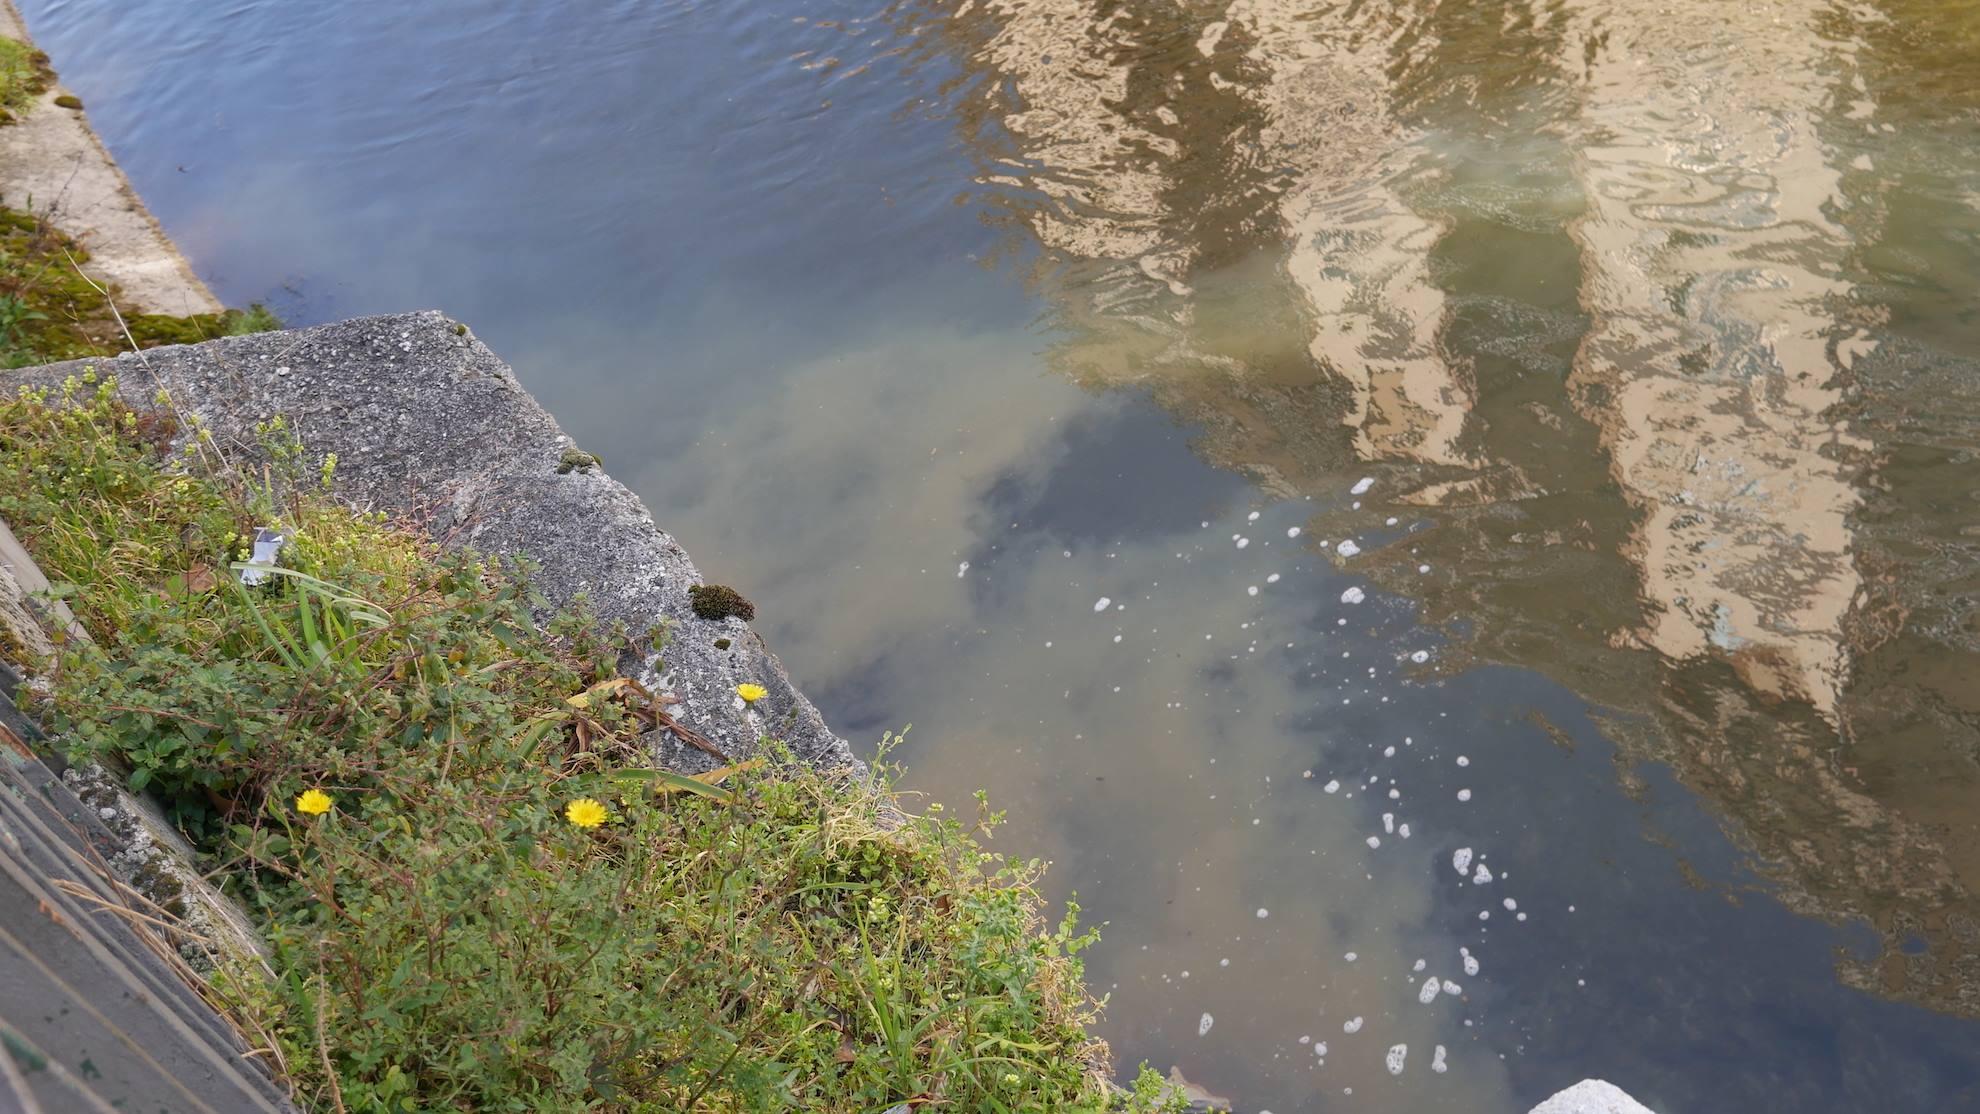 atripalda fiume sabato 2